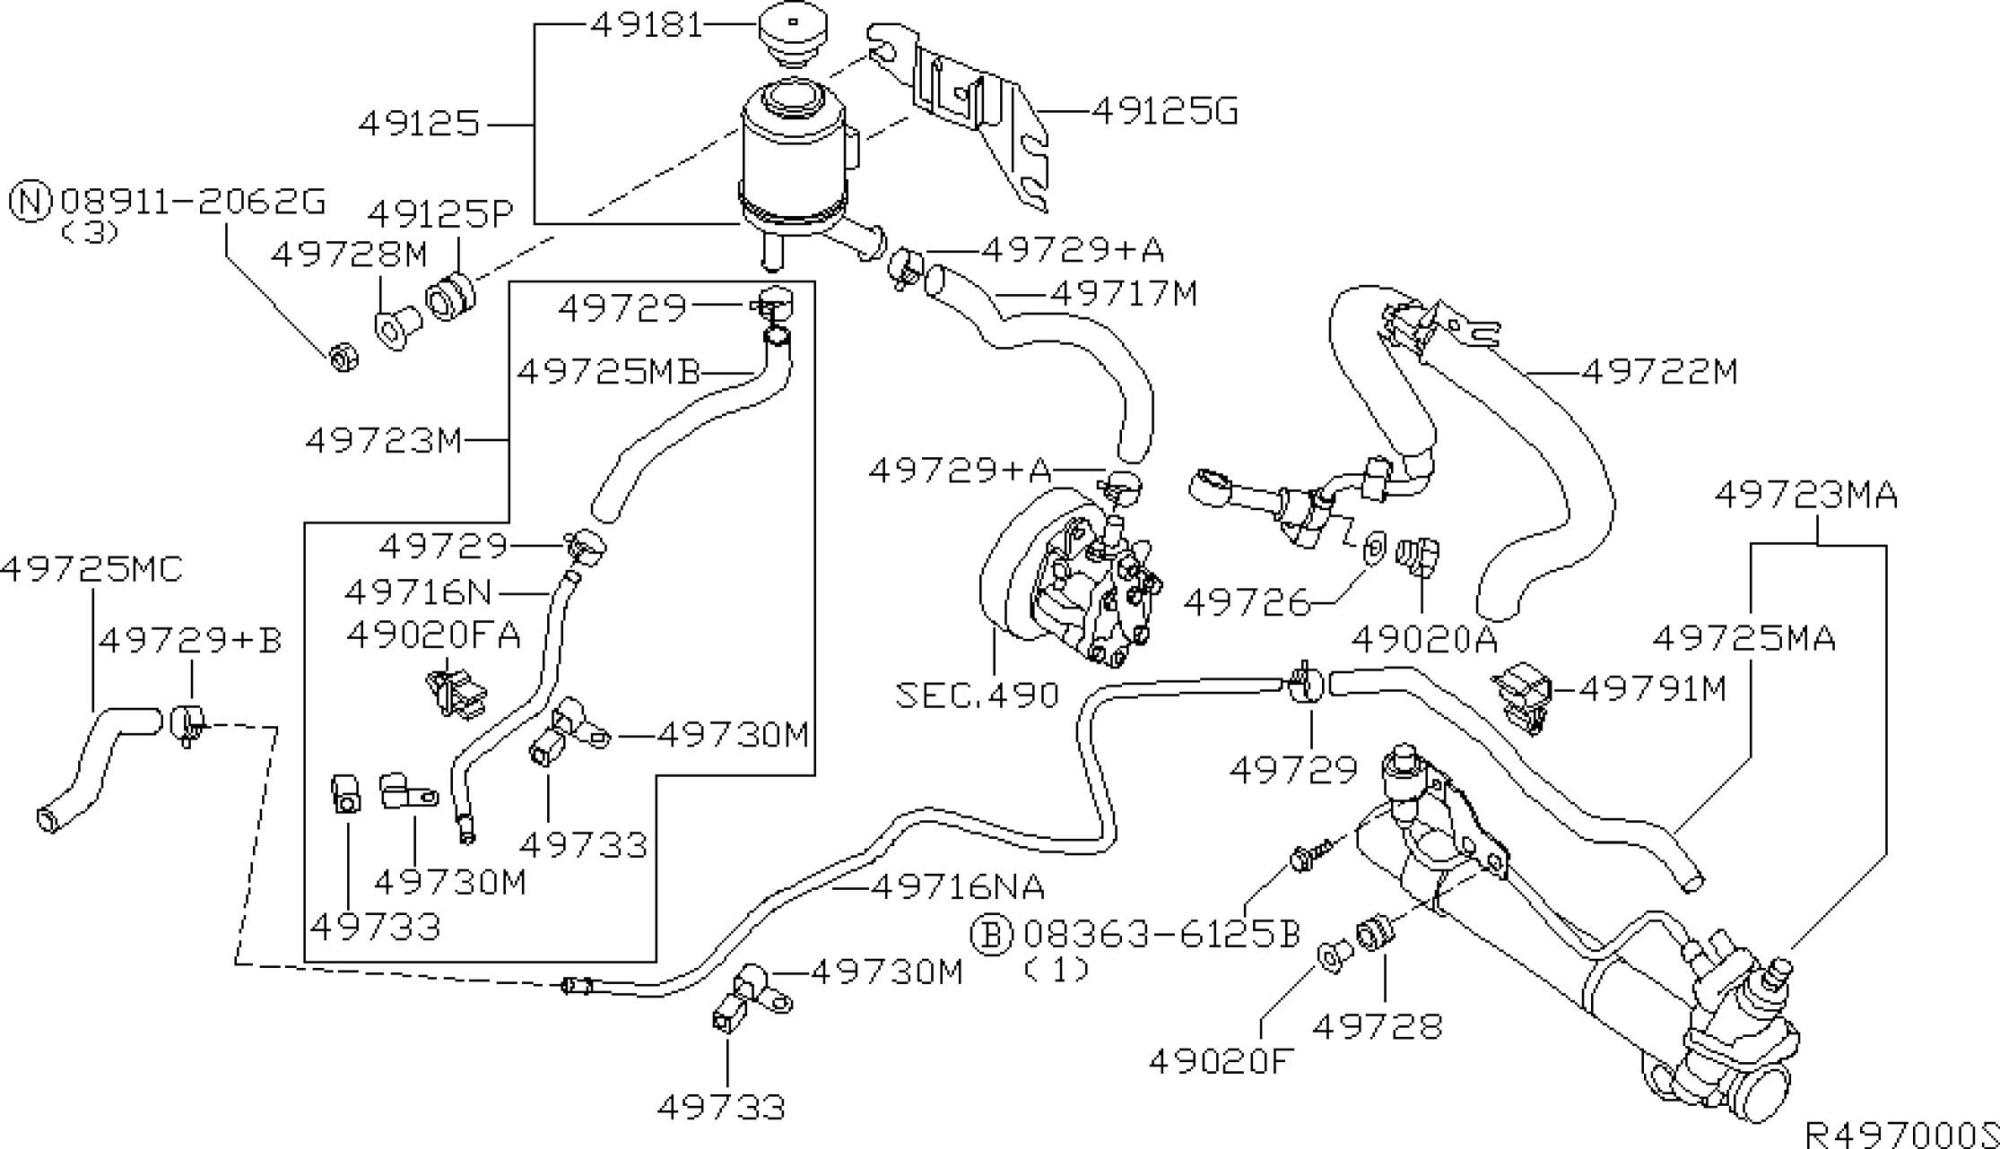 hight resolution of 99 nissan altima engine diagram 2005 nissan altima sedan oem parts nissan usa estore of 99